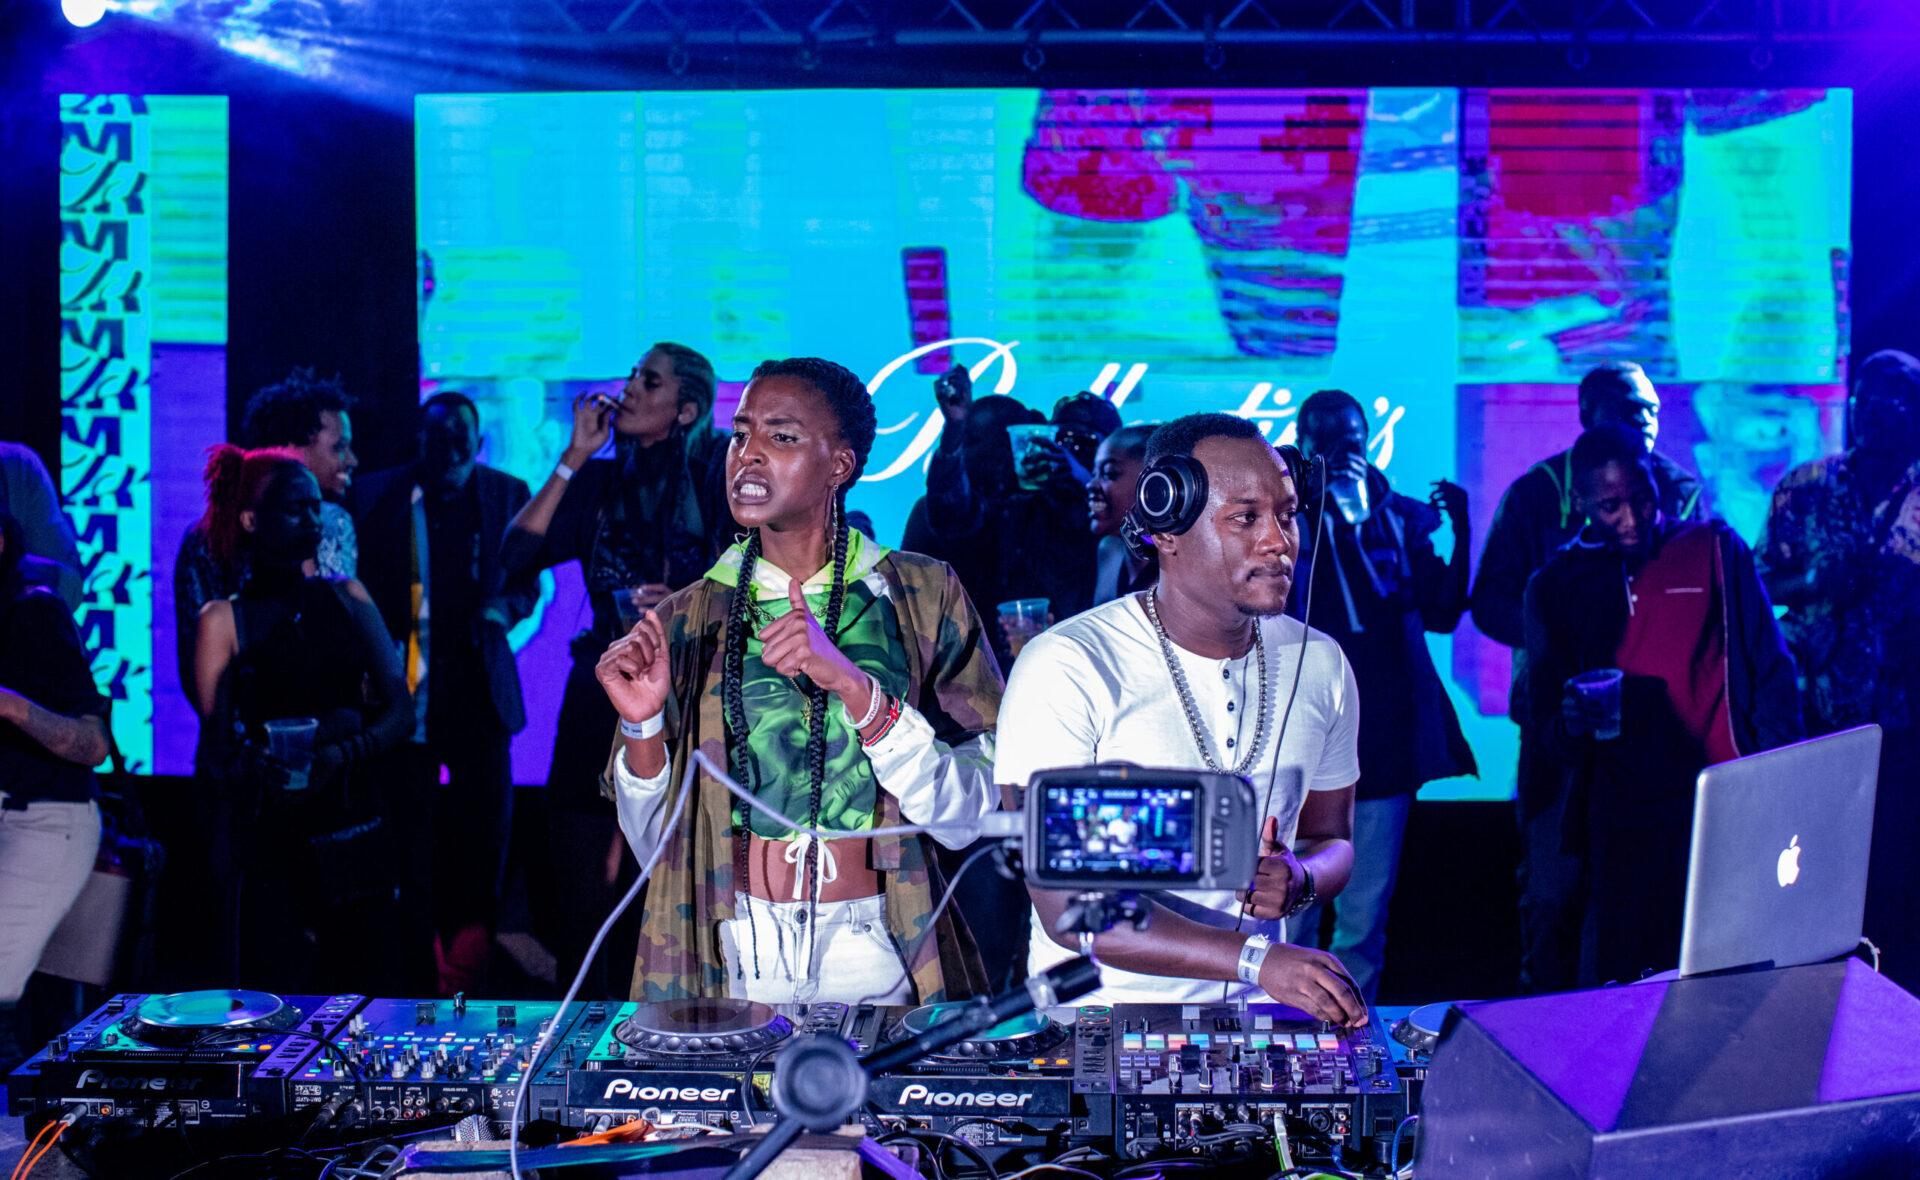 DJ Tryce at Boiler Room x Ballantine's Nairobi